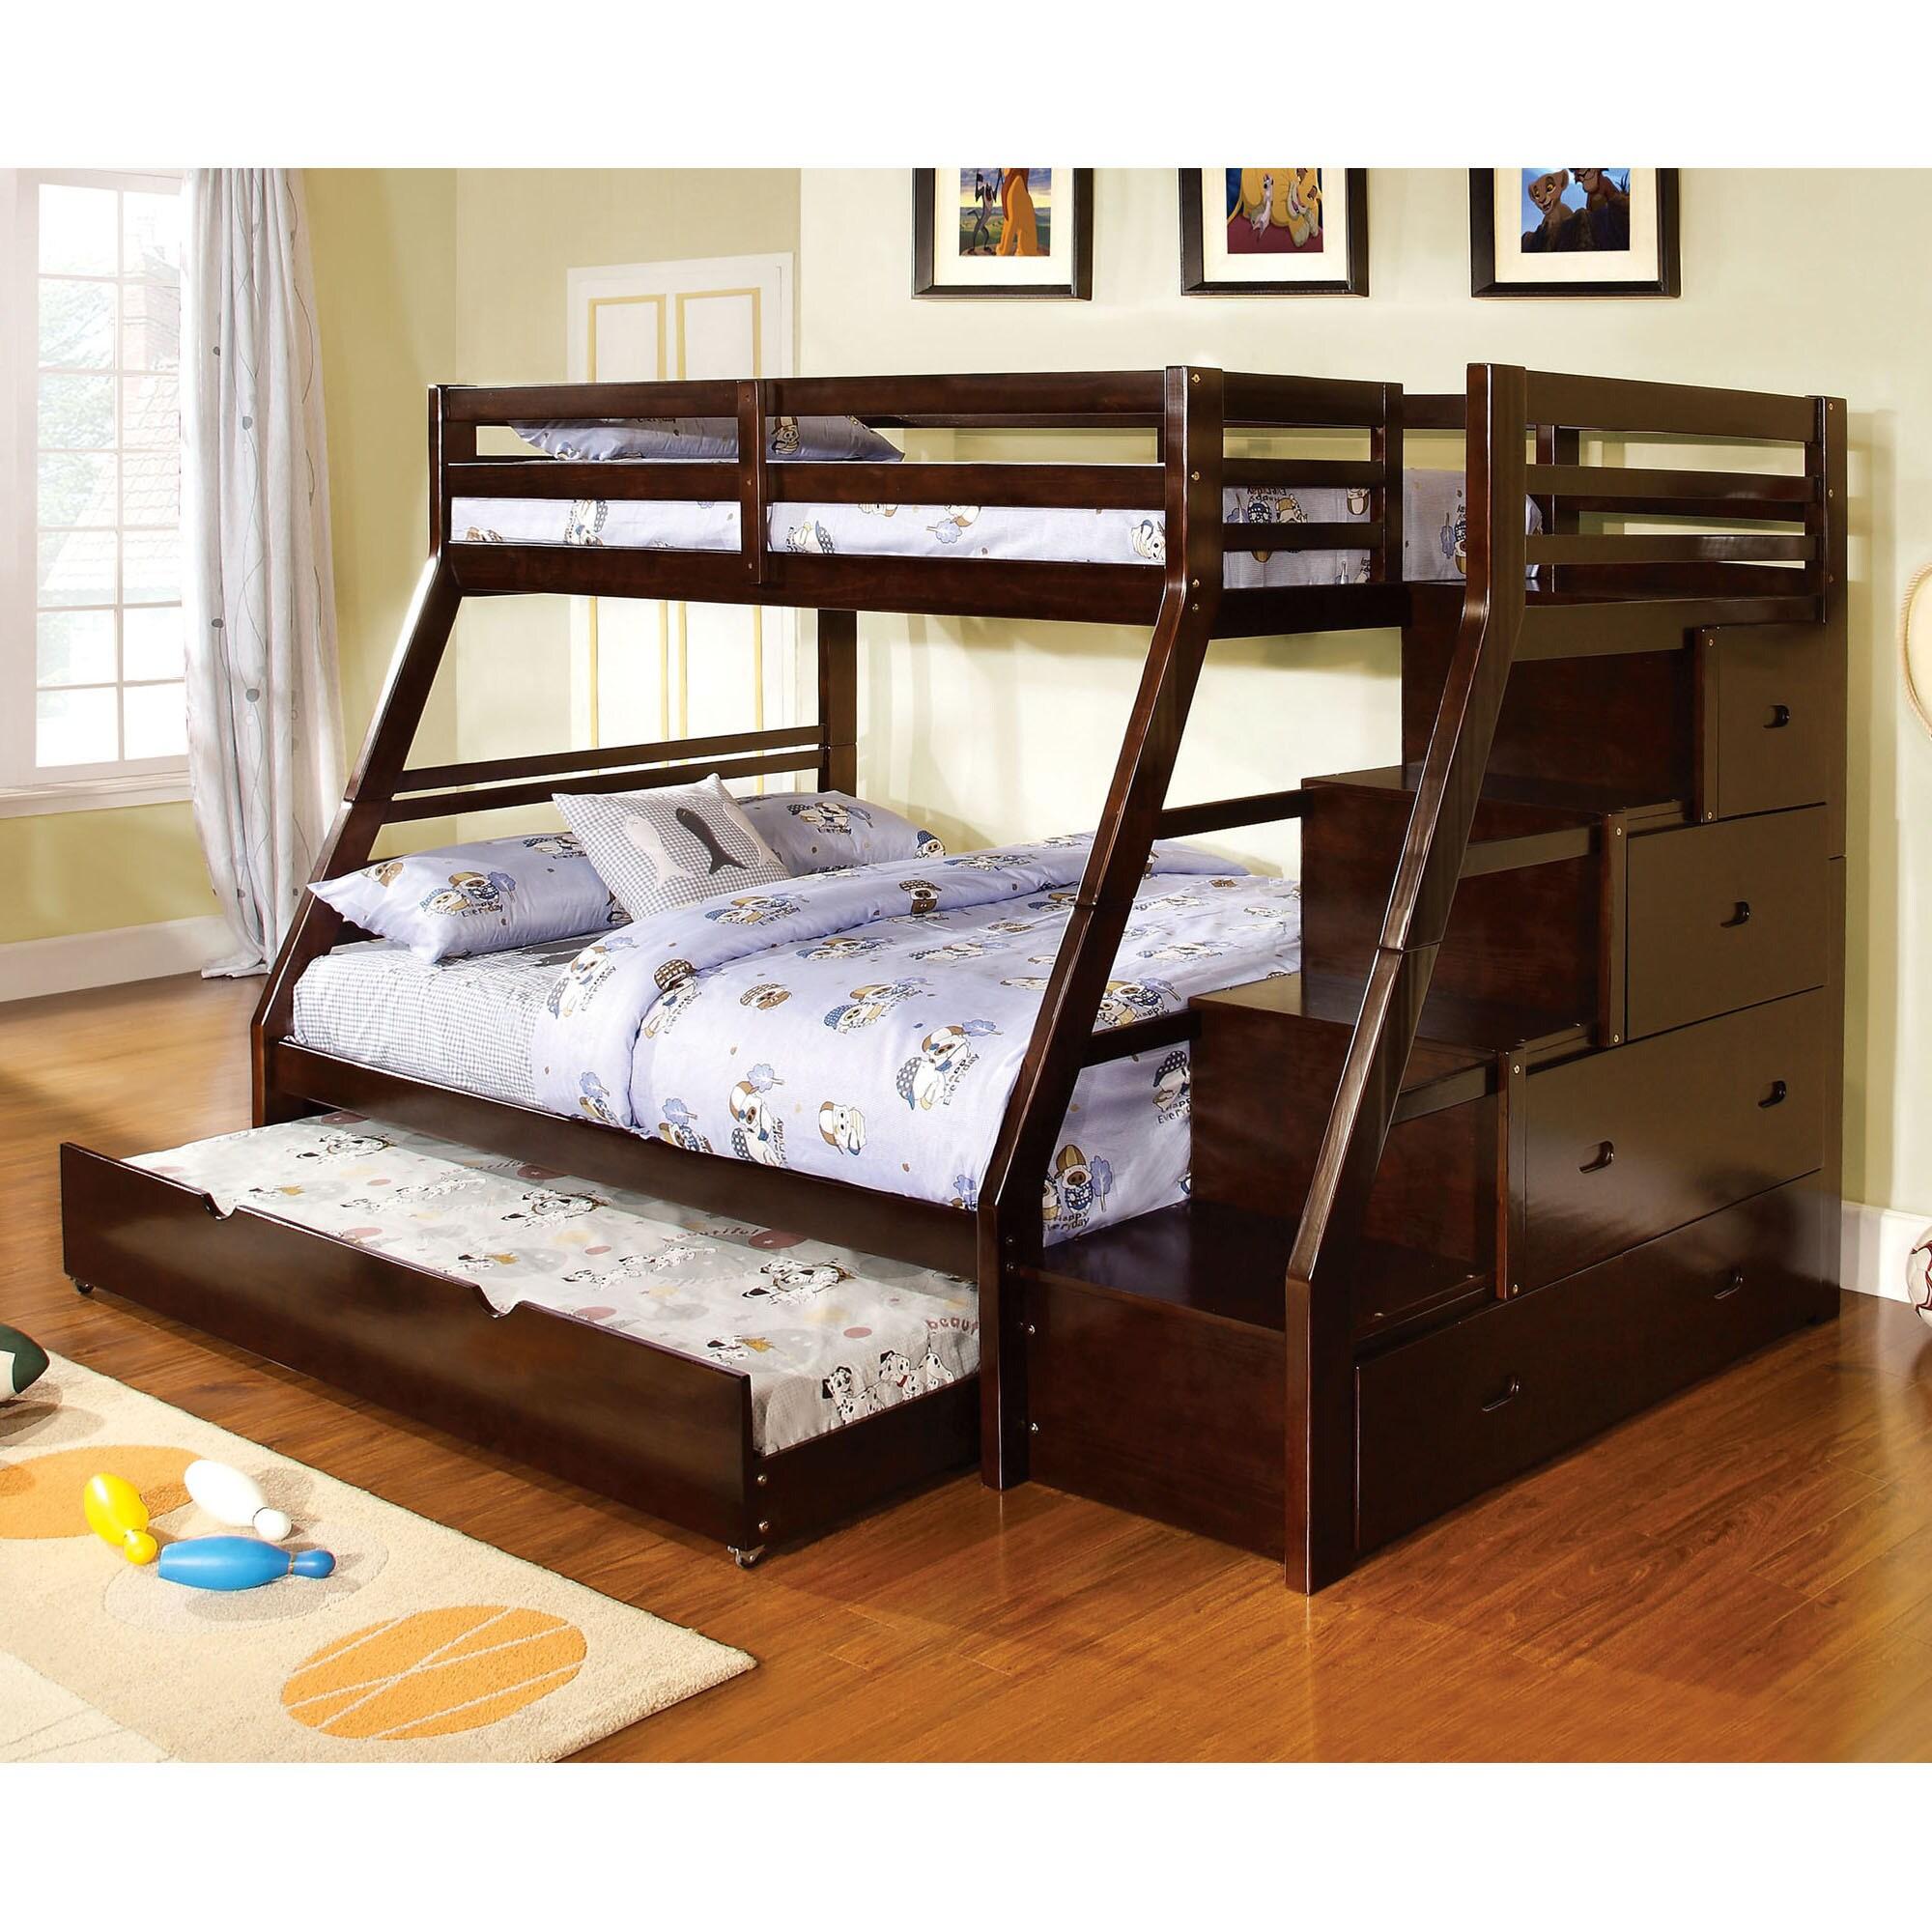 Shop Dark Walnut Finish Twin Over Full Bunk Bed Free Shipping On